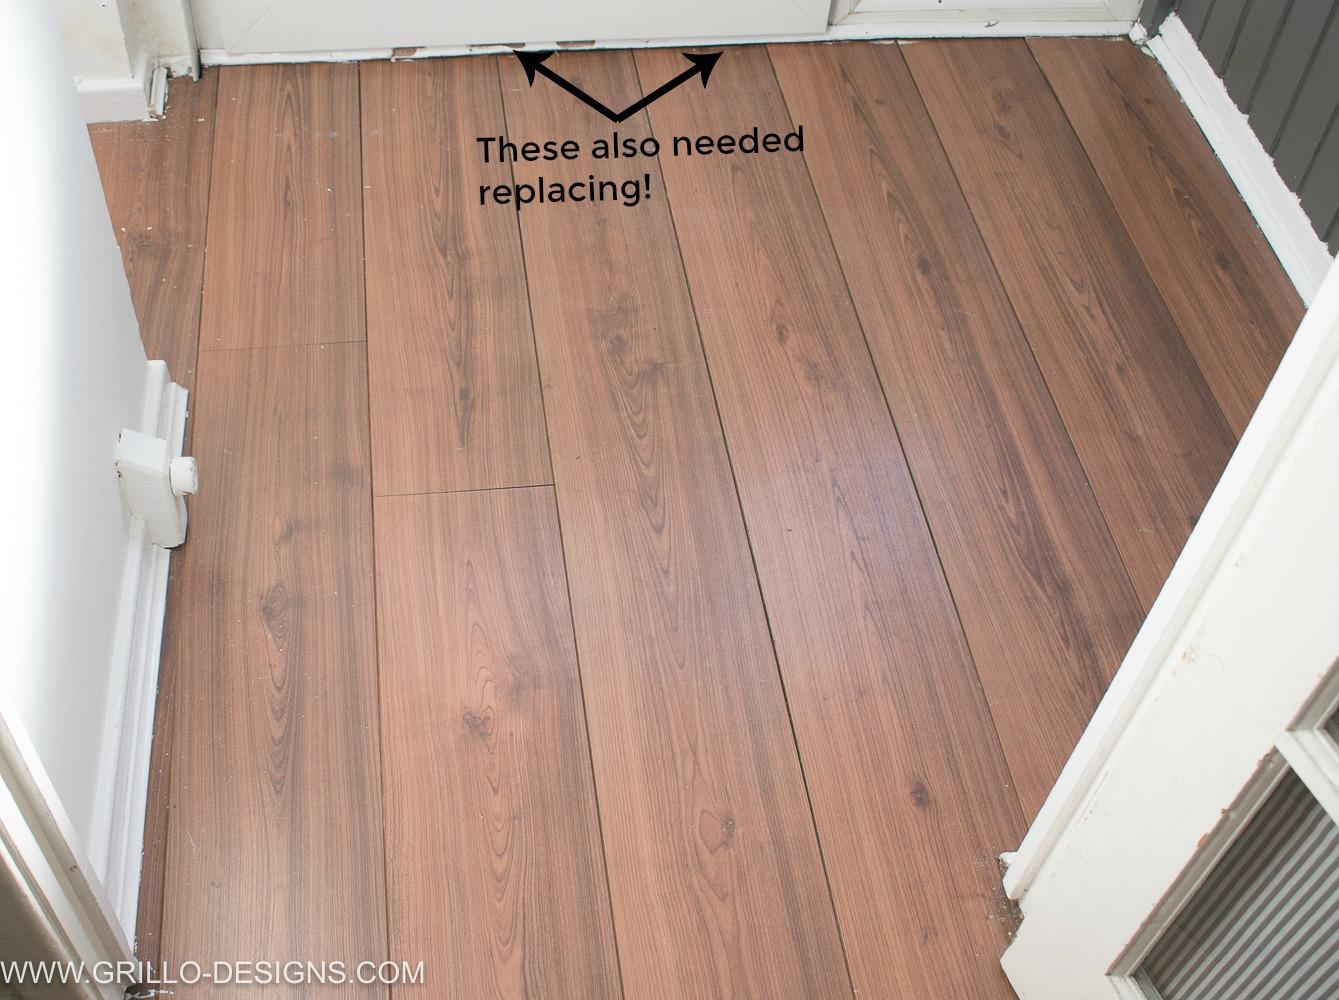 How to Wallpaper A Floor   a renter friendly alternative Grillo 1339x1000